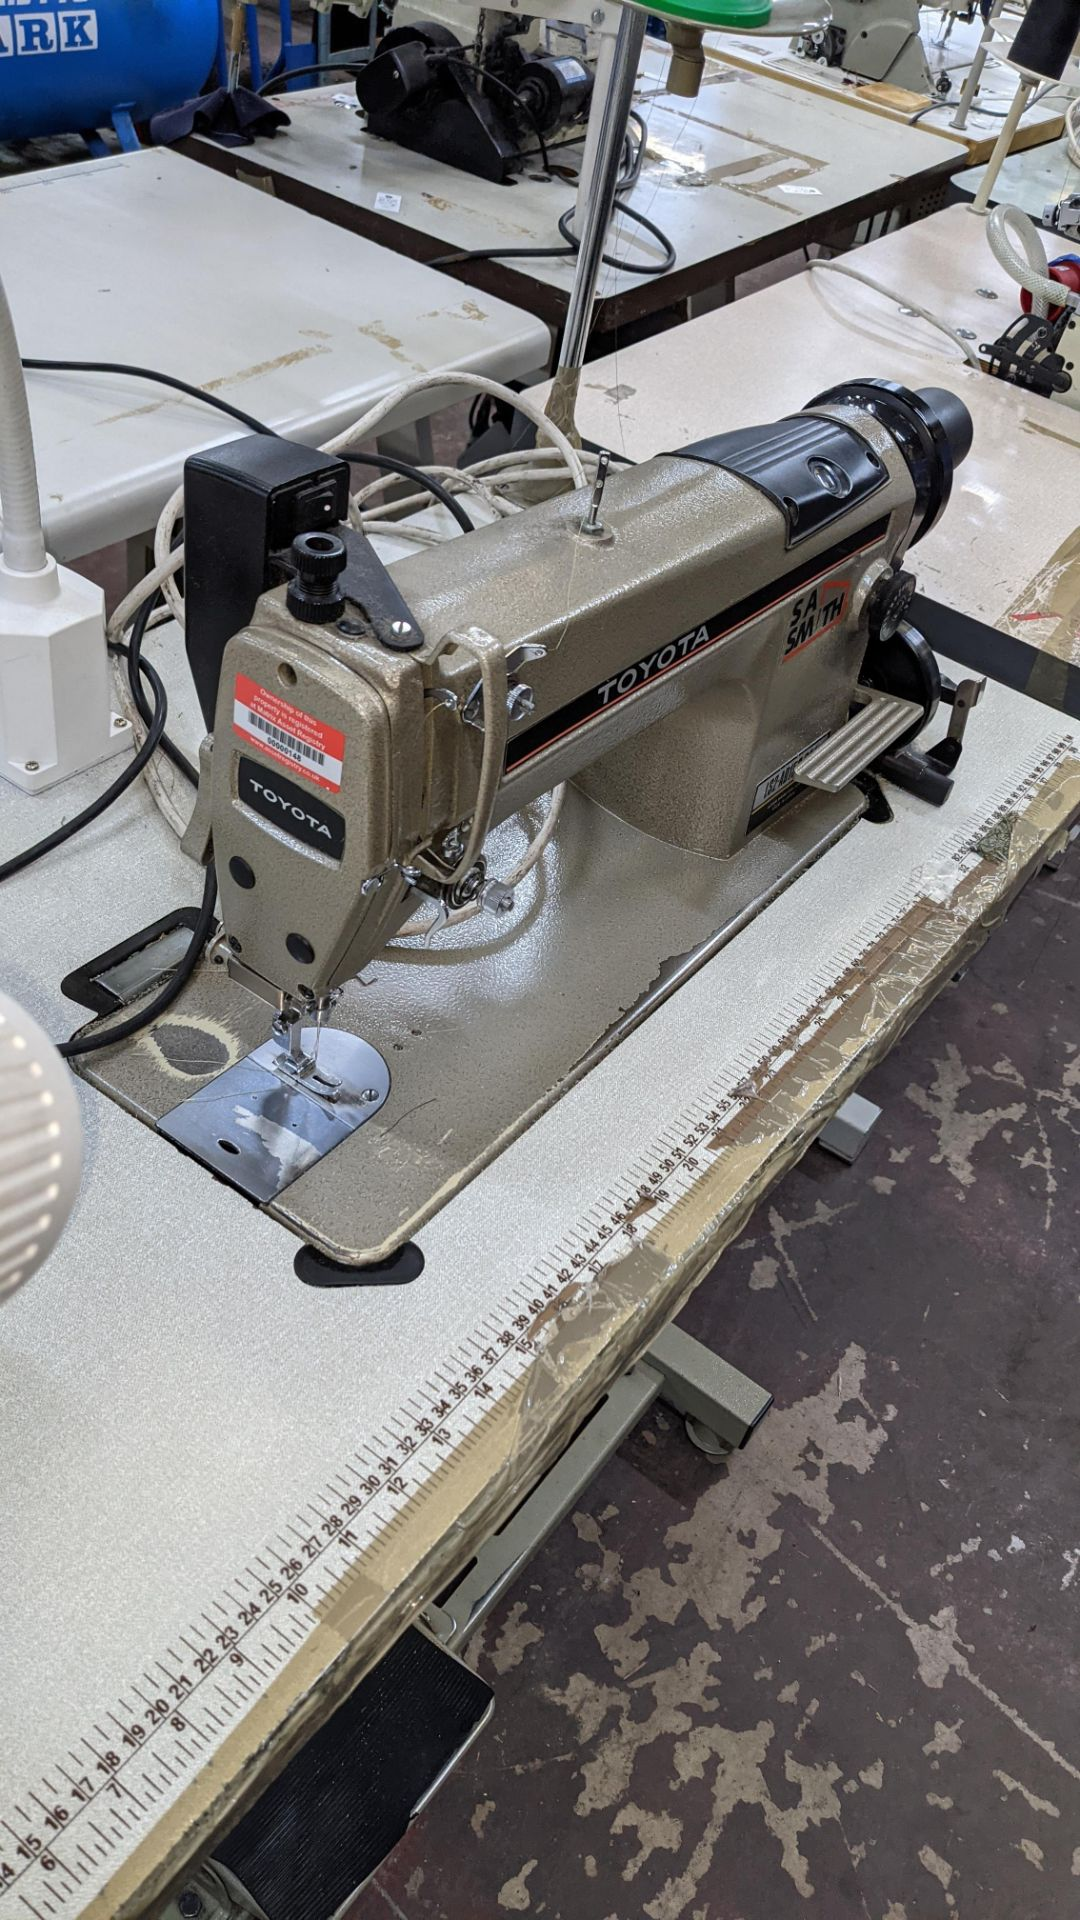 Toyota sewing machine - Image 10 of 17